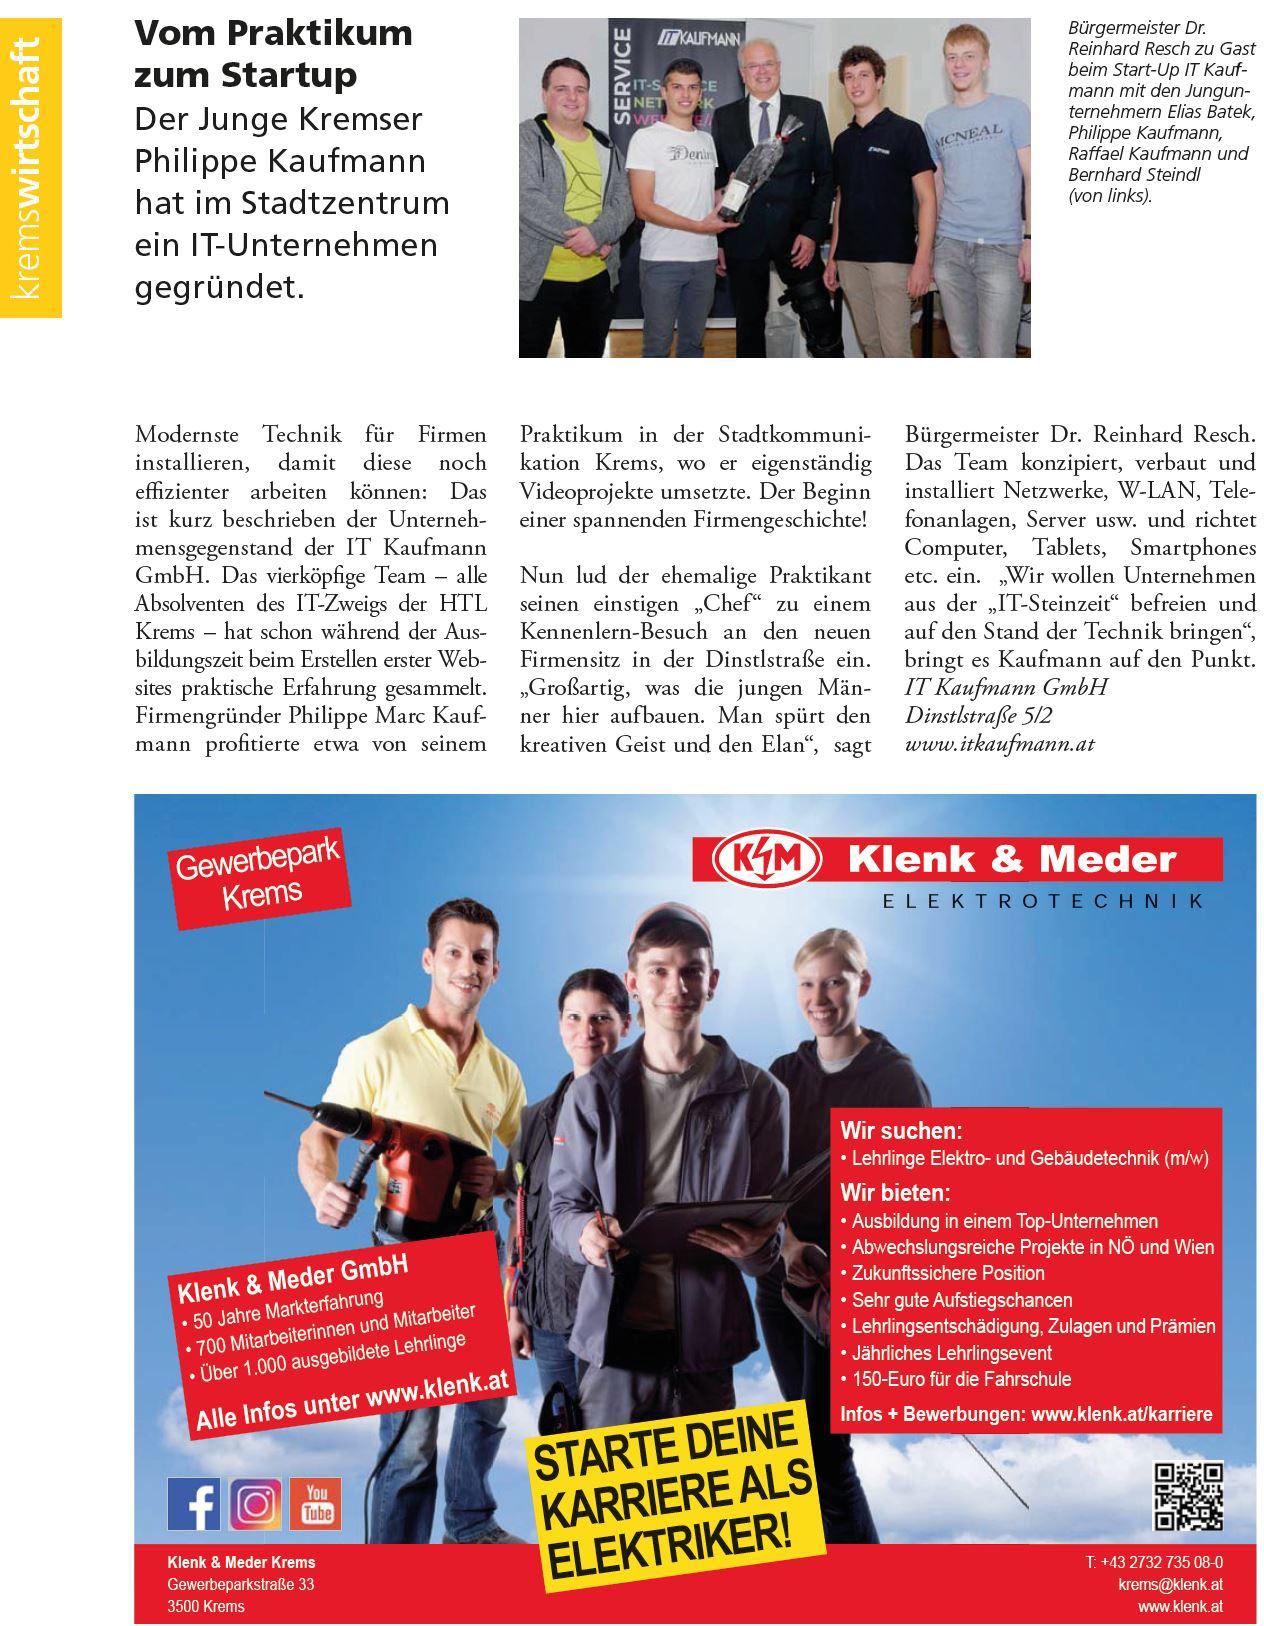 Stadtjournal Krems - Vom Praktikum zum Startup